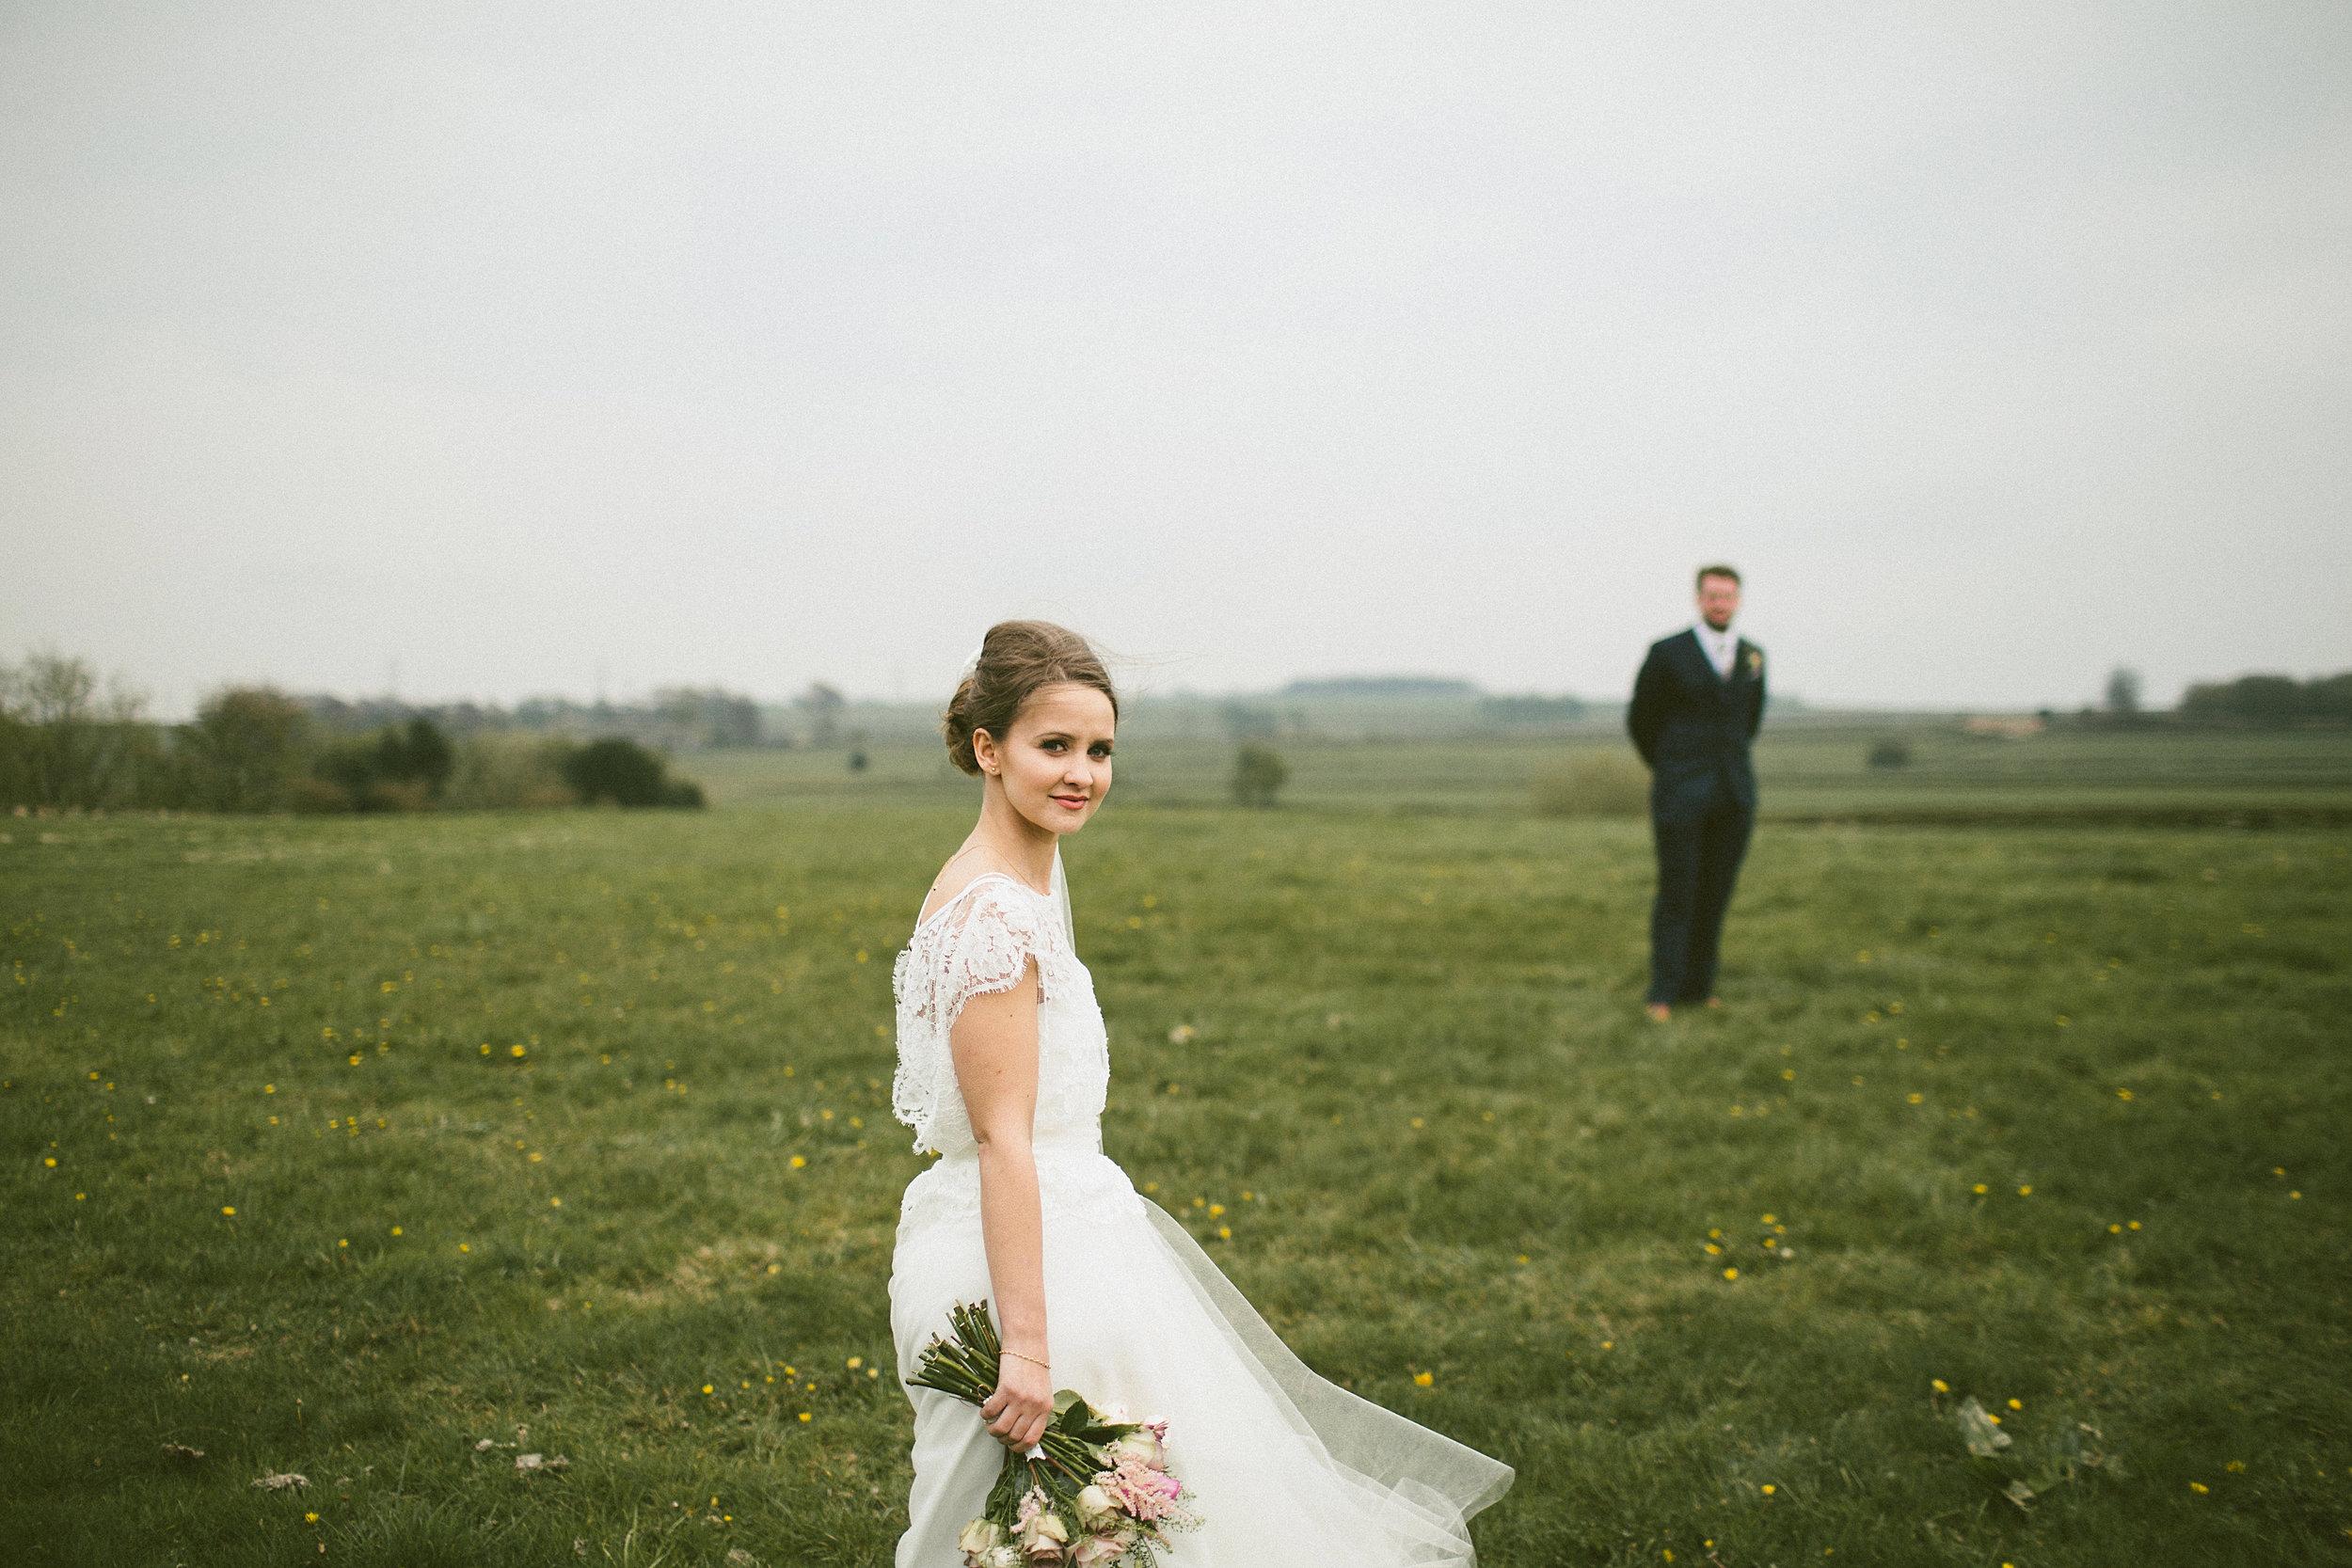 Samantha-Yorkshire-Sheffield-Bespoke-Vintage-Lace-Tulle-Bride-Wedding-Dress-Susanna-Greening-Derbyshire-10